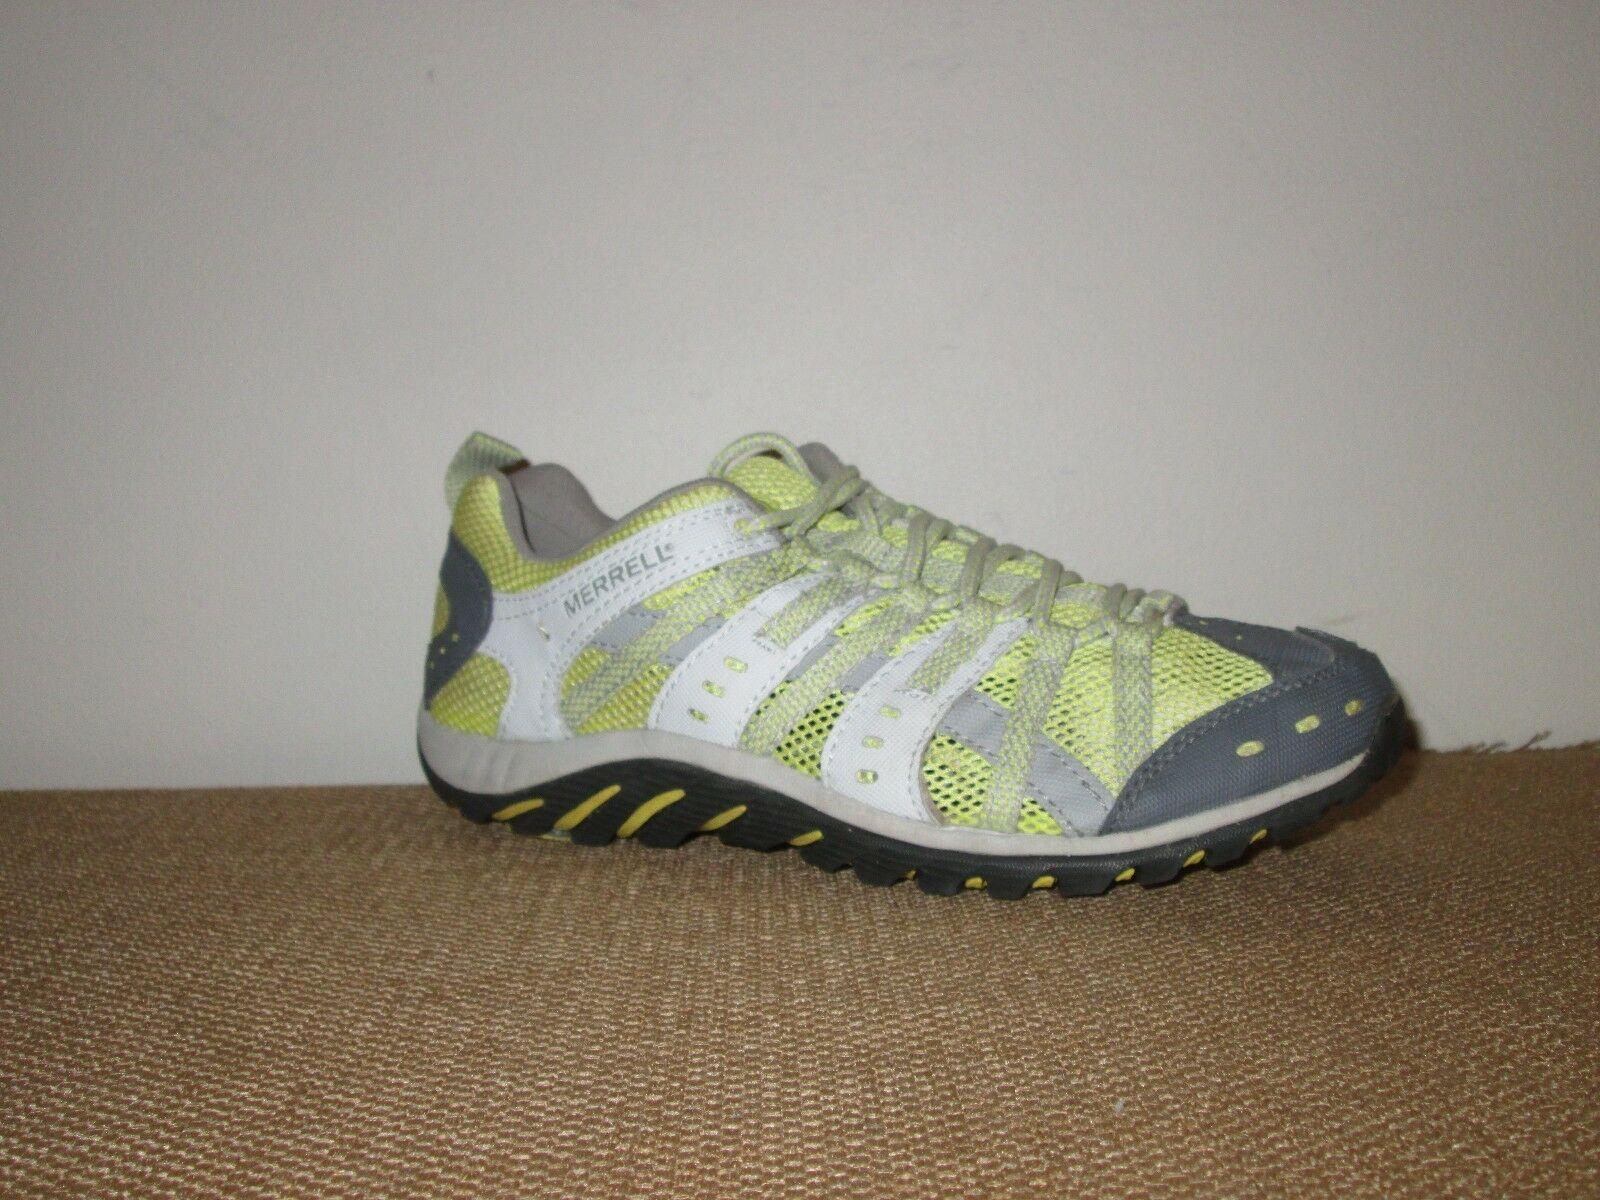 MERRELL Mykos Women's Lime Ventilate  Aquatic Hiking Running shoes Sneakers 7.5